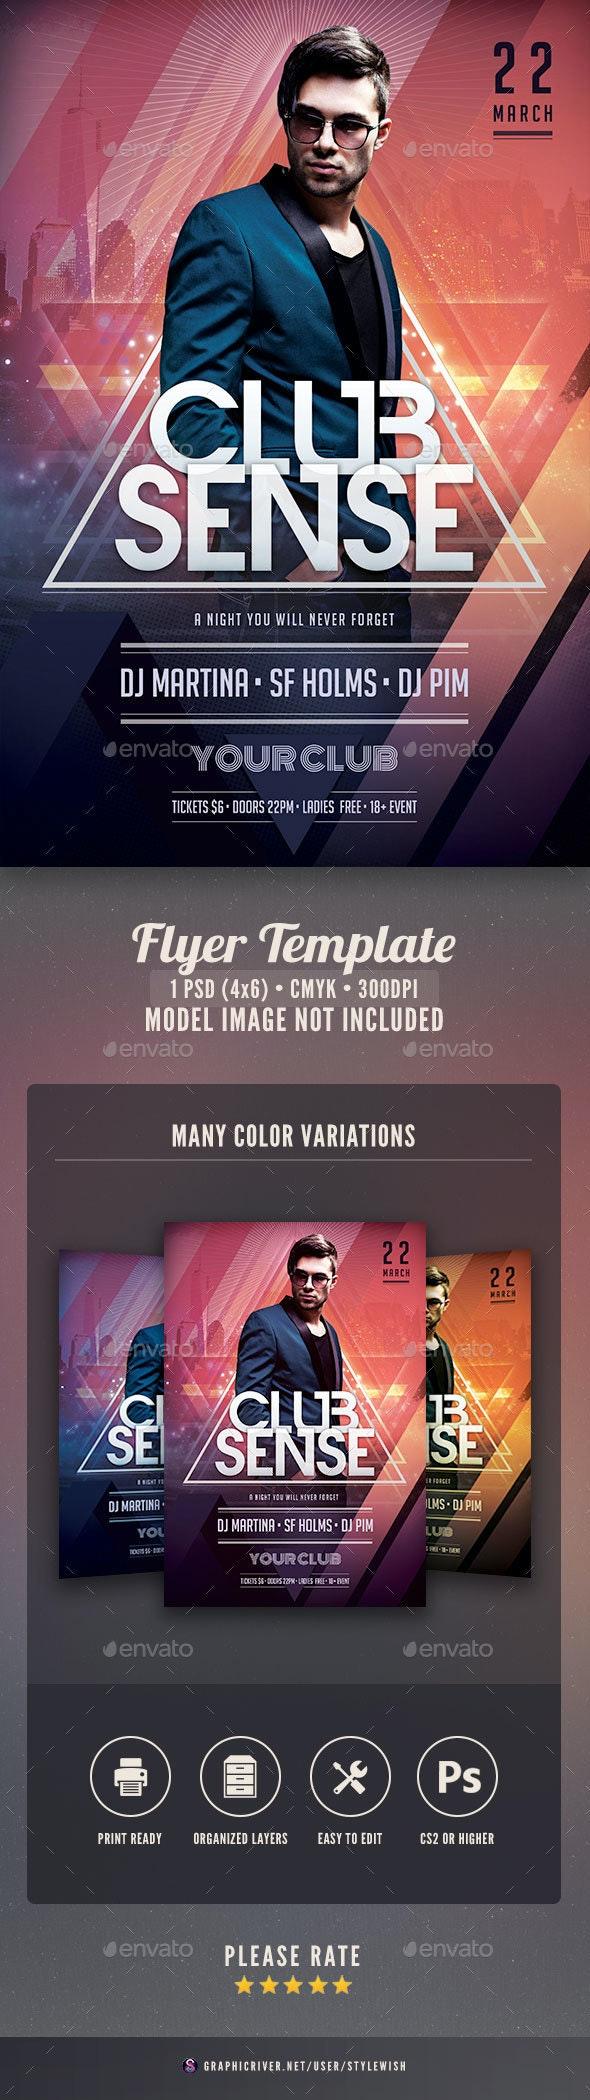 Club Sense Flyer - Clubs & Parties Events